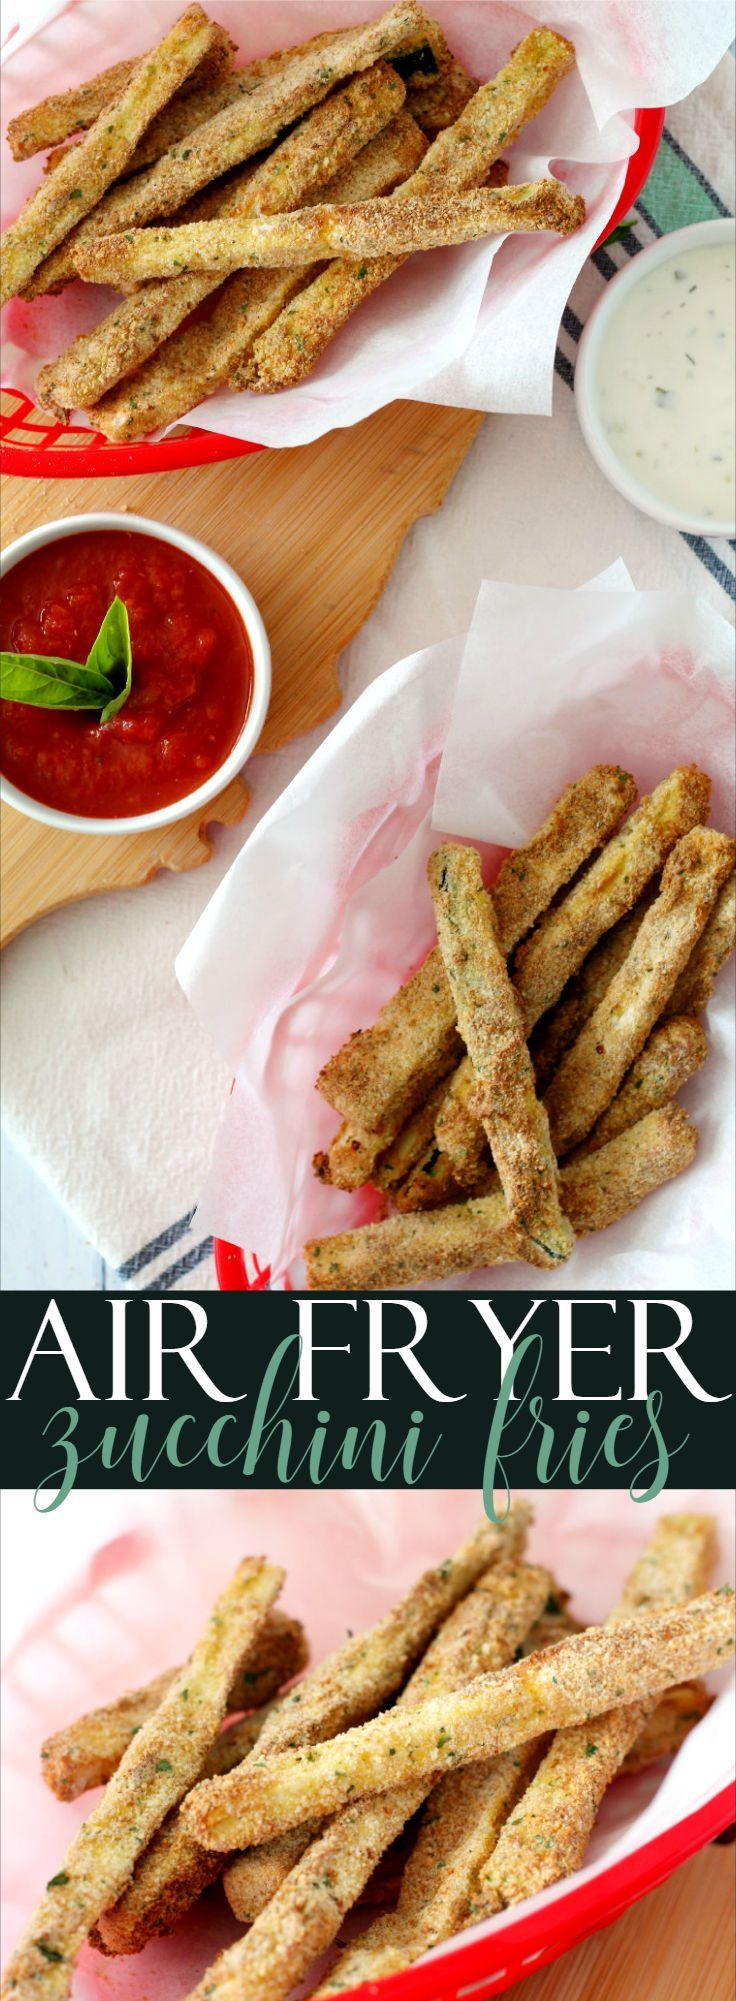 Air Fryer Zucchini Fries Living La Vida Holoka Recipe